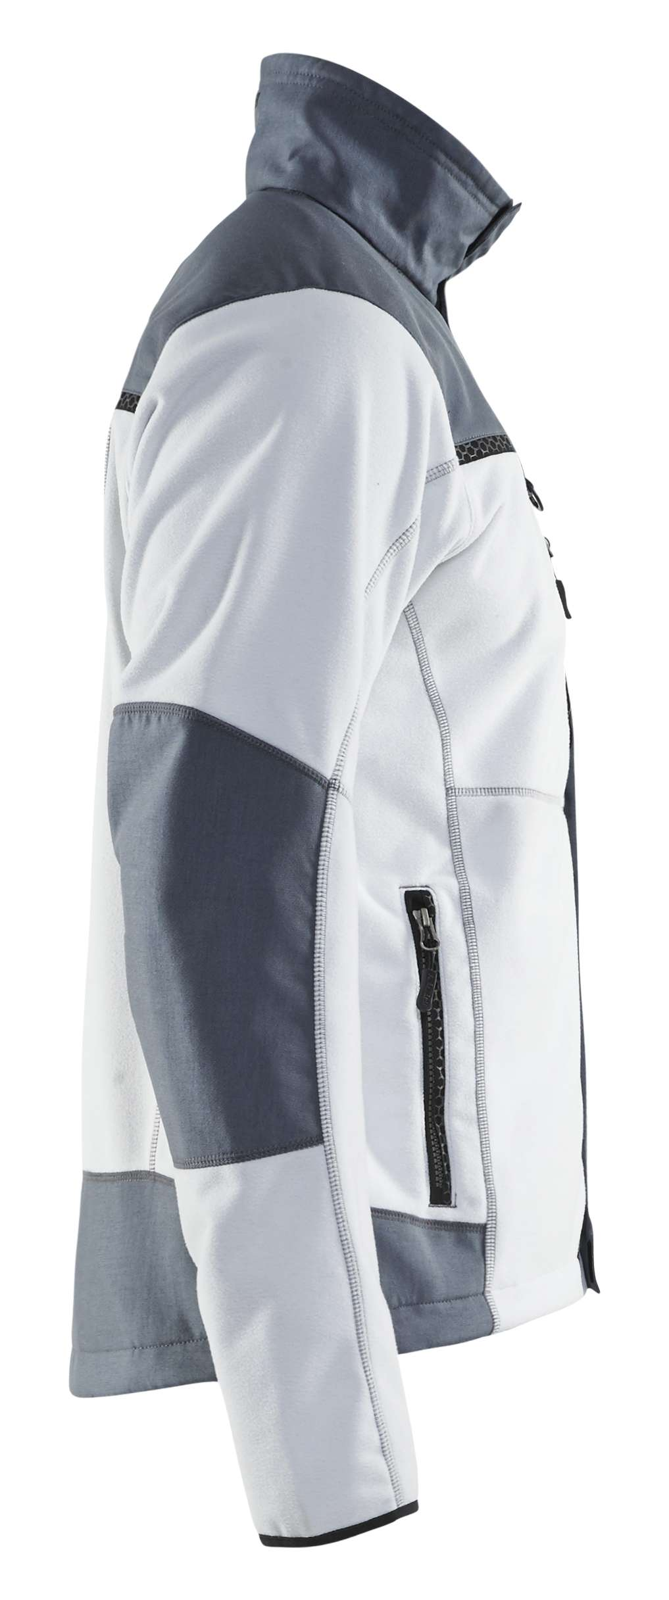 Blaklader Fleece jassen 49552524 wit-grijs(1094)